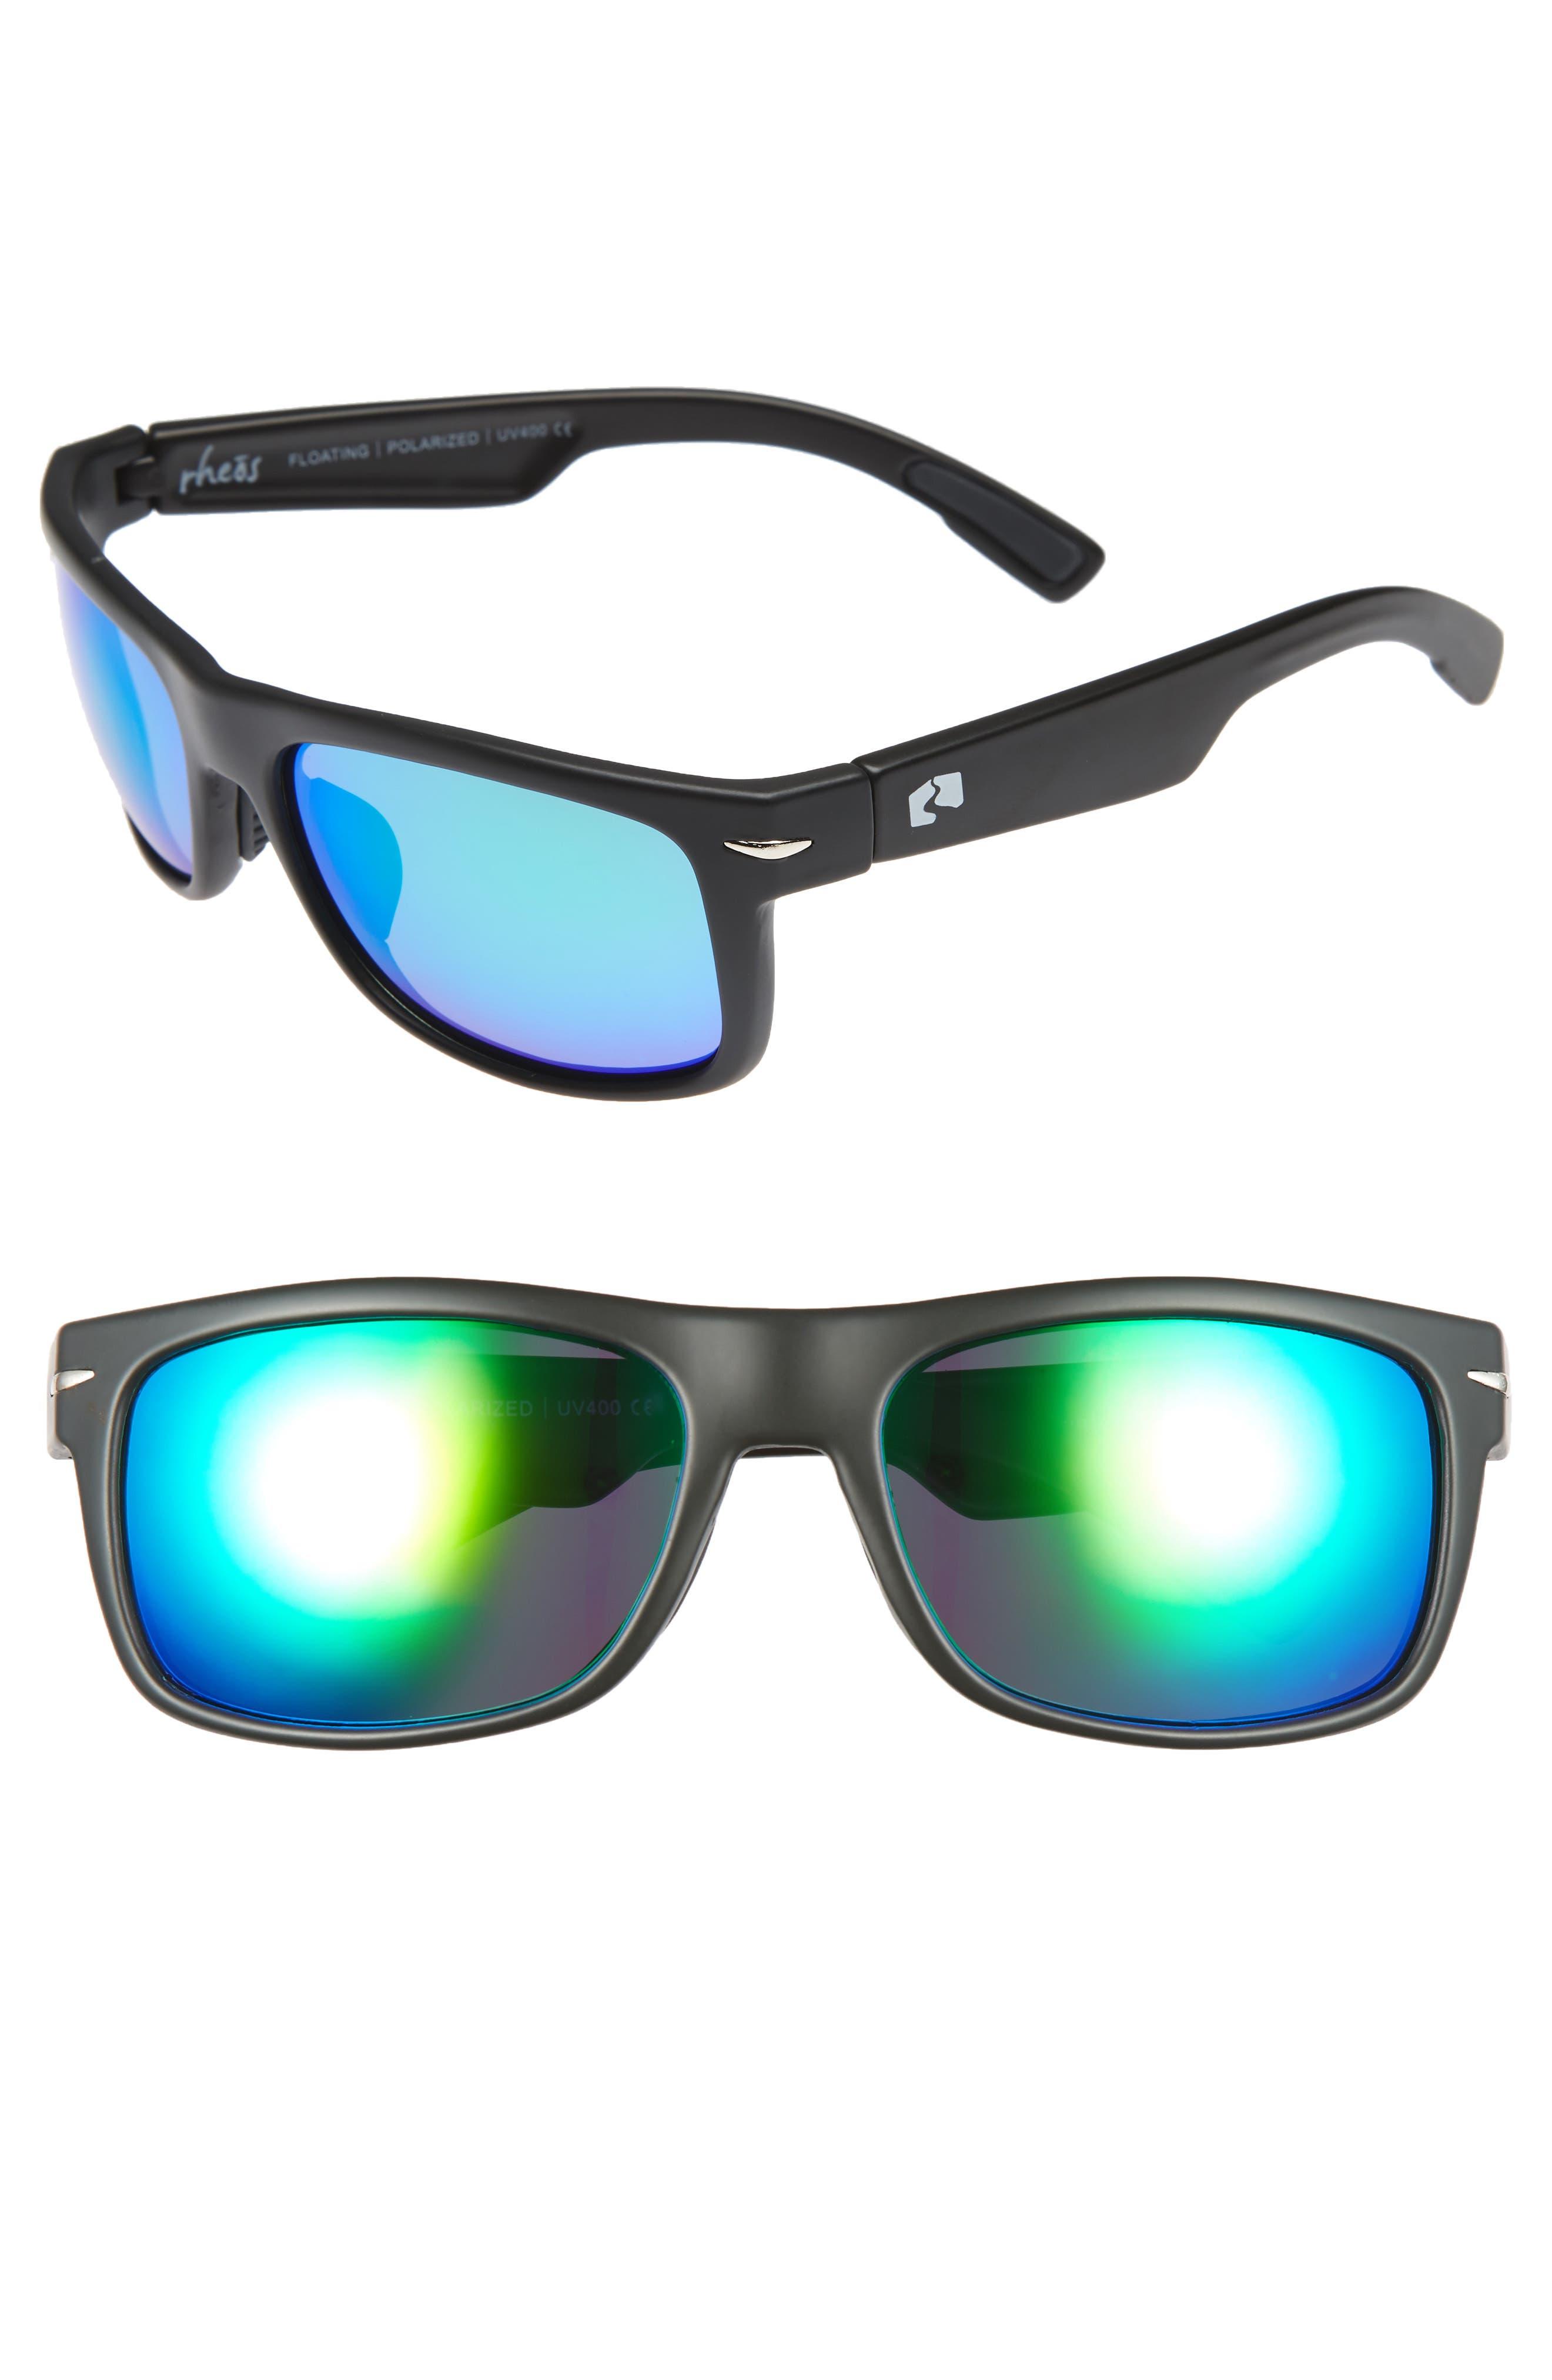 Main Image - Rheos Anhingas Floating 59mm Polarized Sunglasses